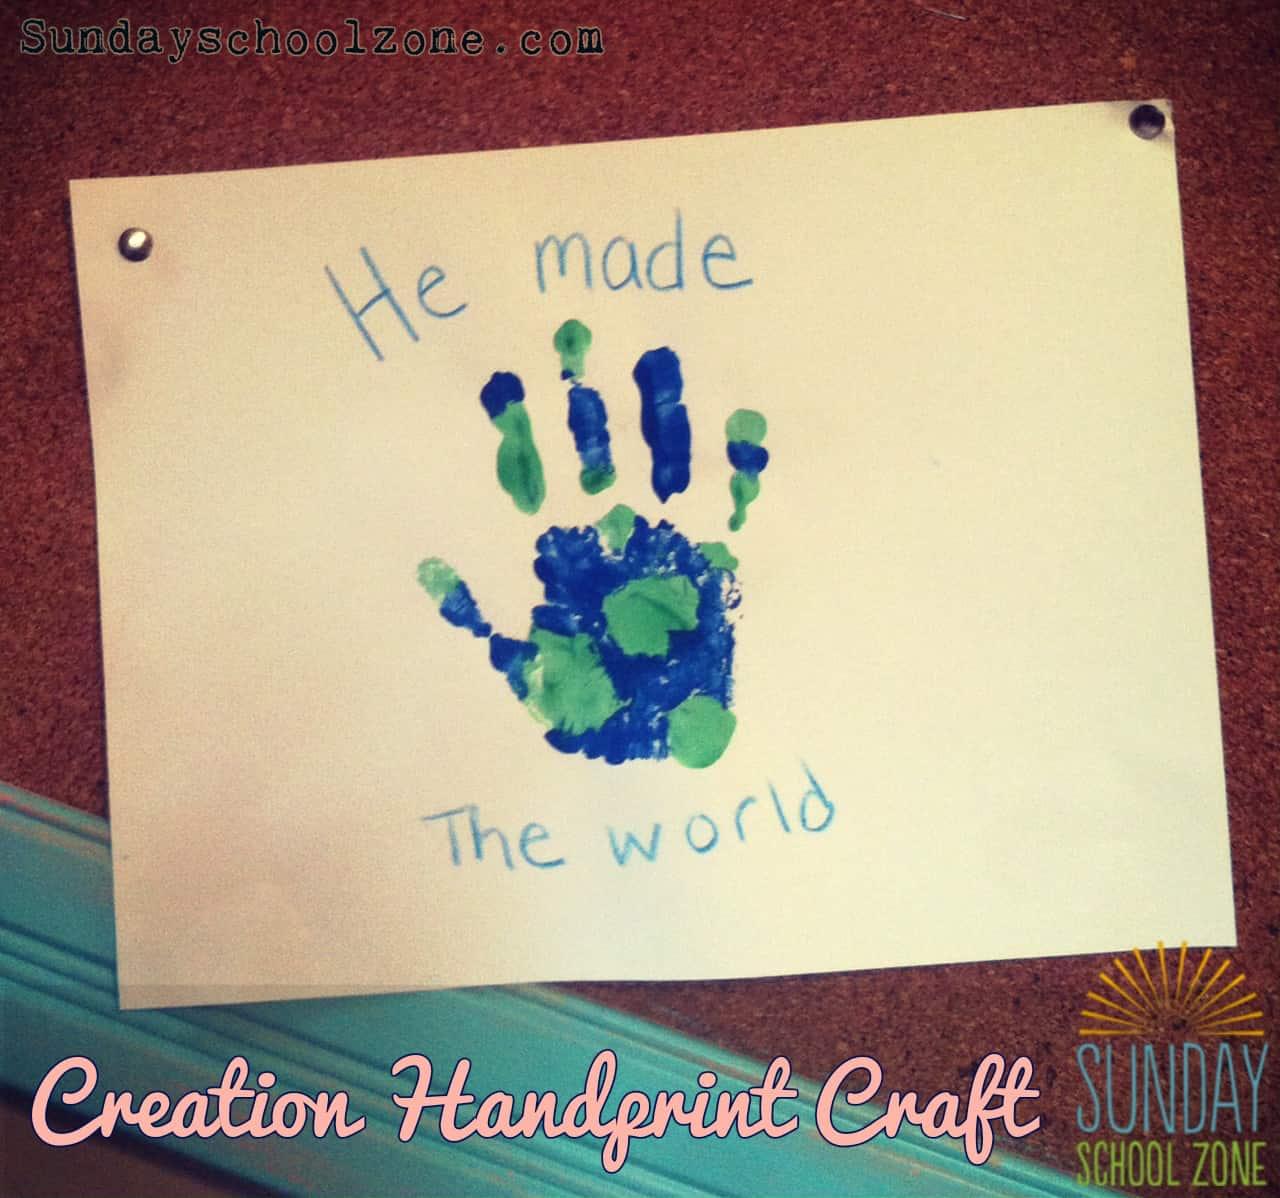 Creation Handprint Craft